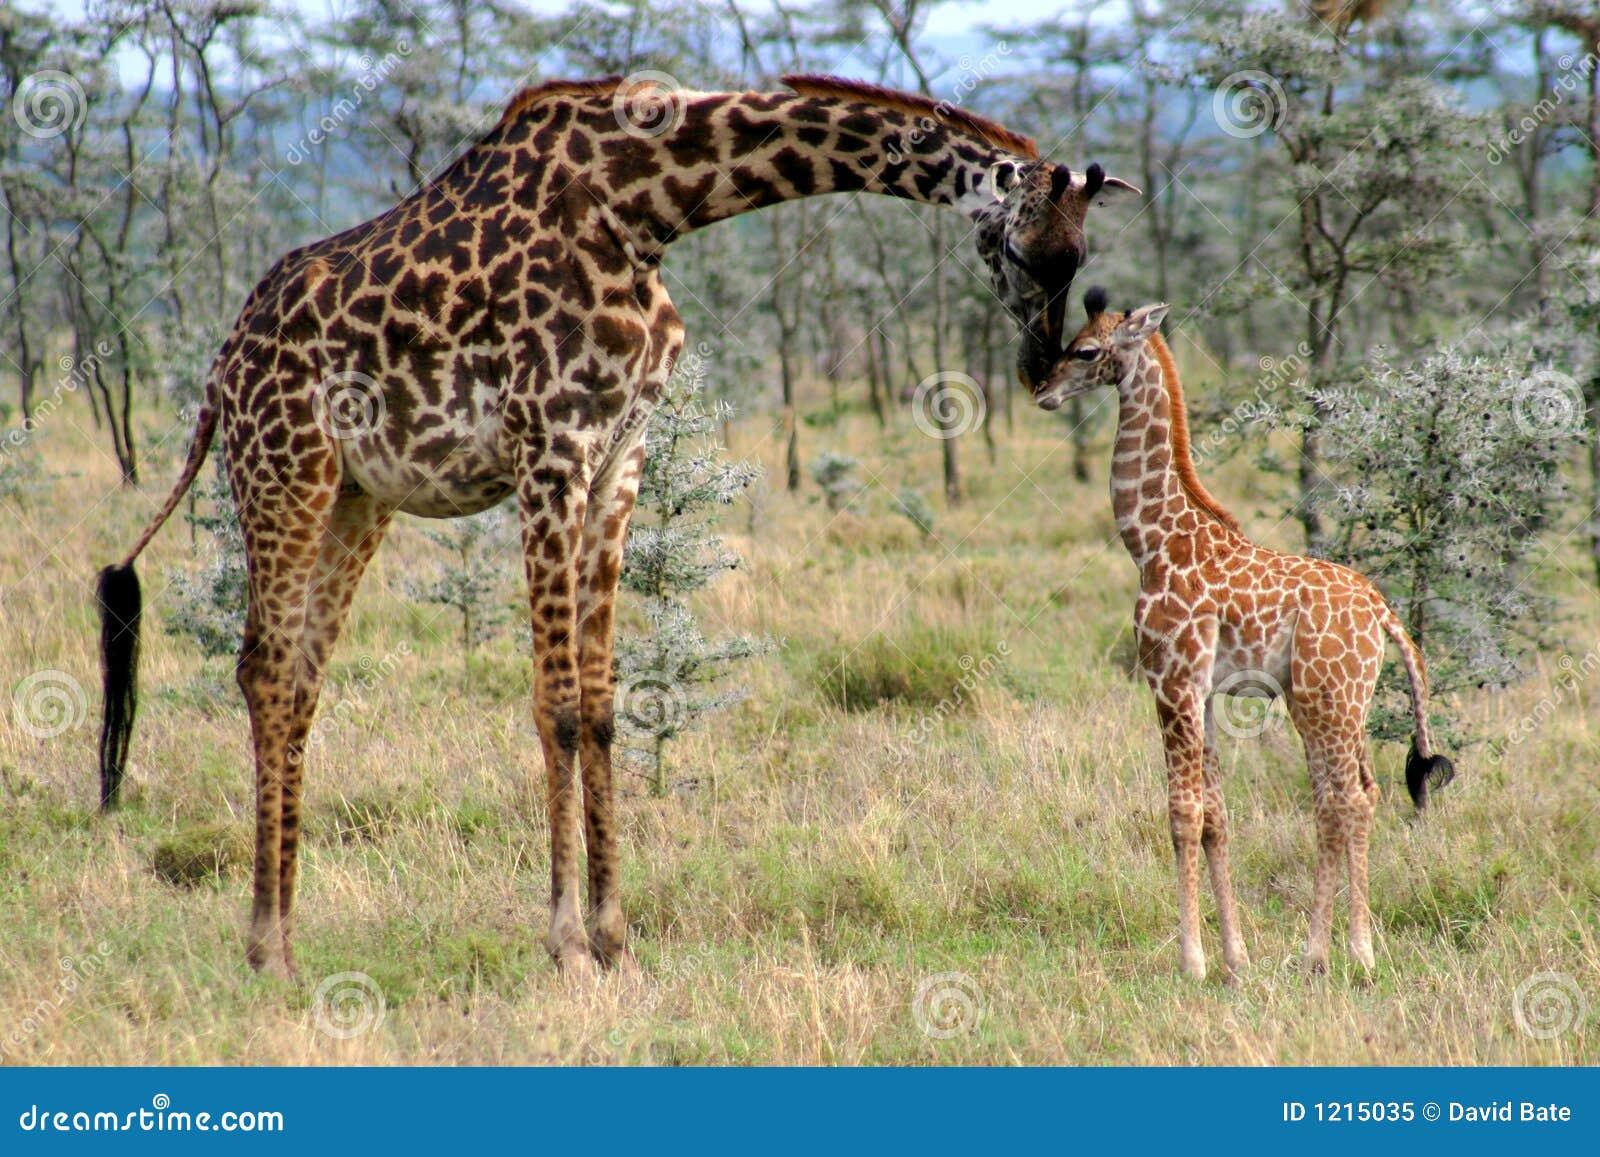 Mom And Baby Giraffe Stock Image Image Of Famly Embrace 1215035